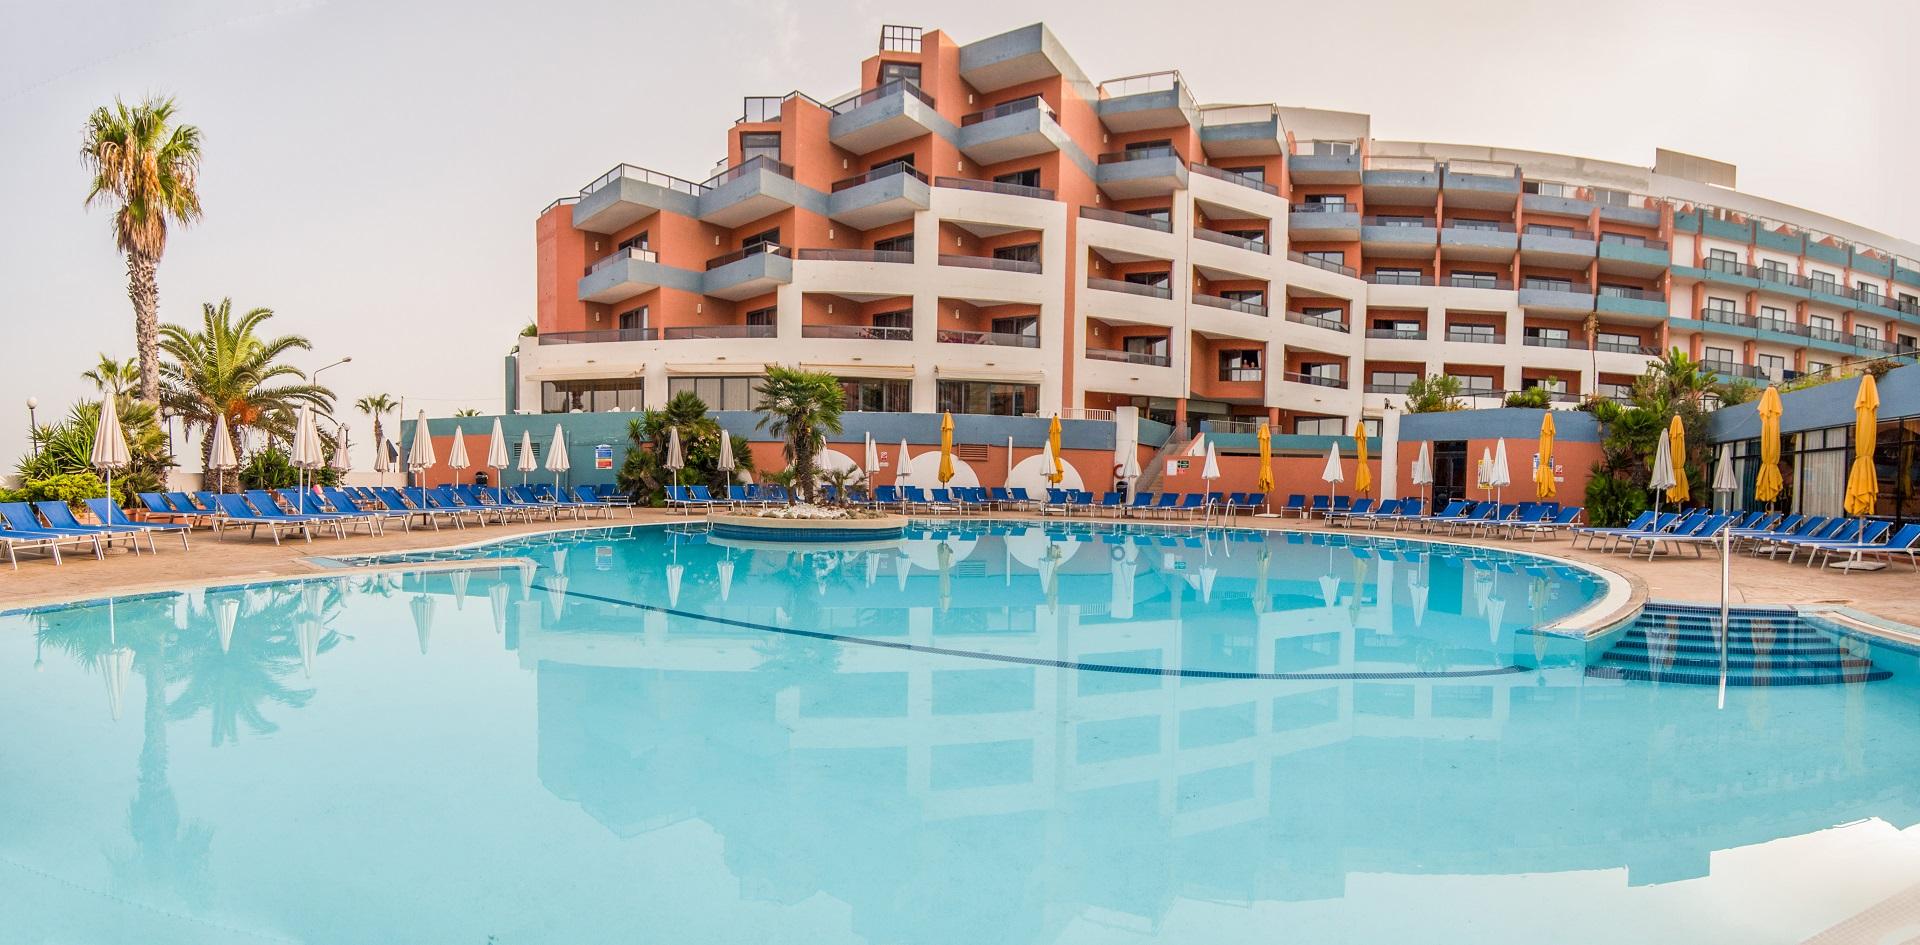 http://cdn.budavartours.hu/binaries/content/gallery/budavar/locations/accomodations/M%C3%A1lta/st.-paul-s-bay/The+Dolmen+Resort+Hotel+%26+Casino/dolmen-resort-malta-grounds-swim-up-bar.jpg